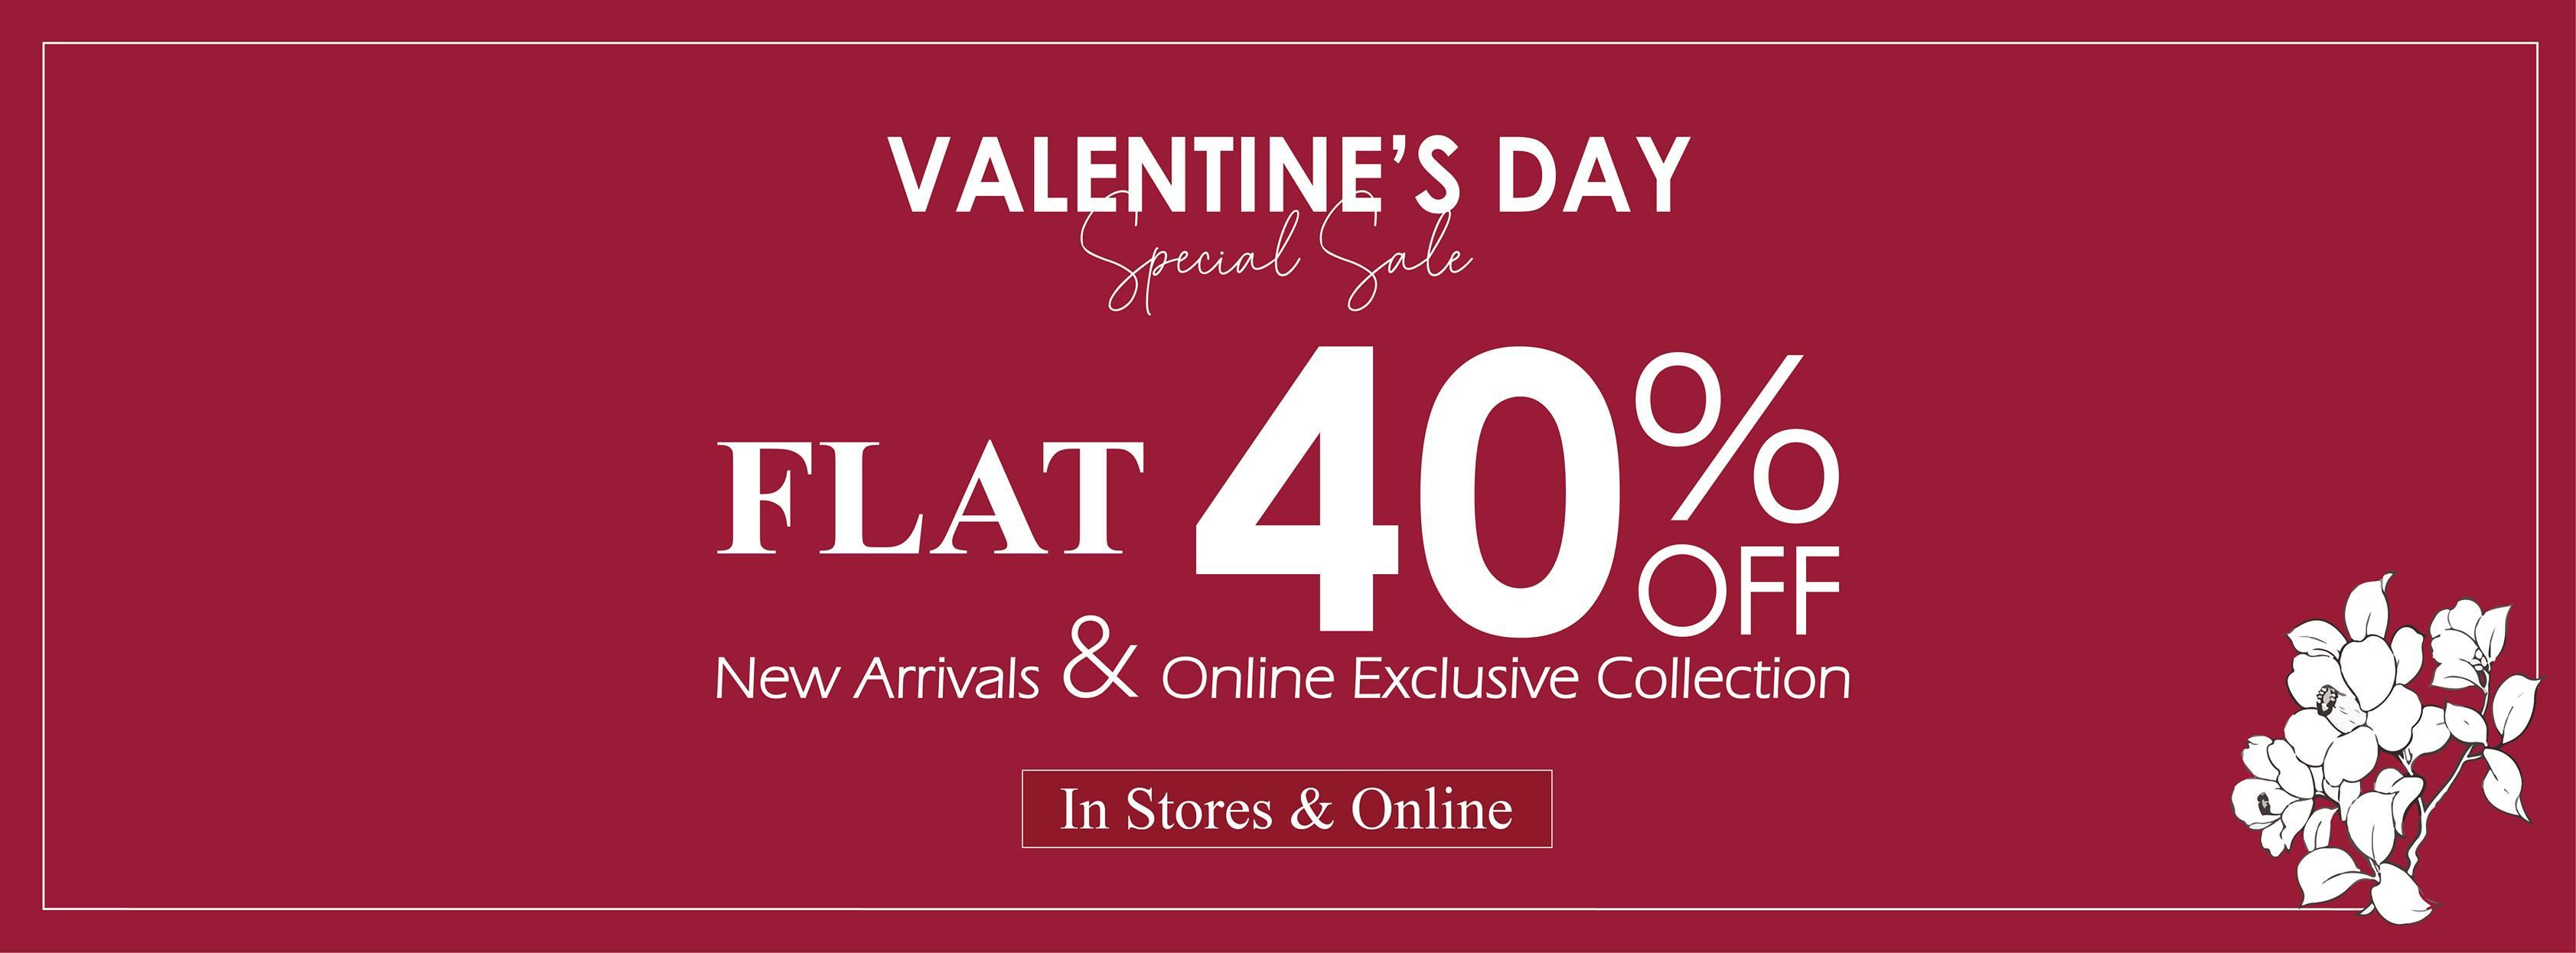 Kross Kulture - Valentine's Day Sale